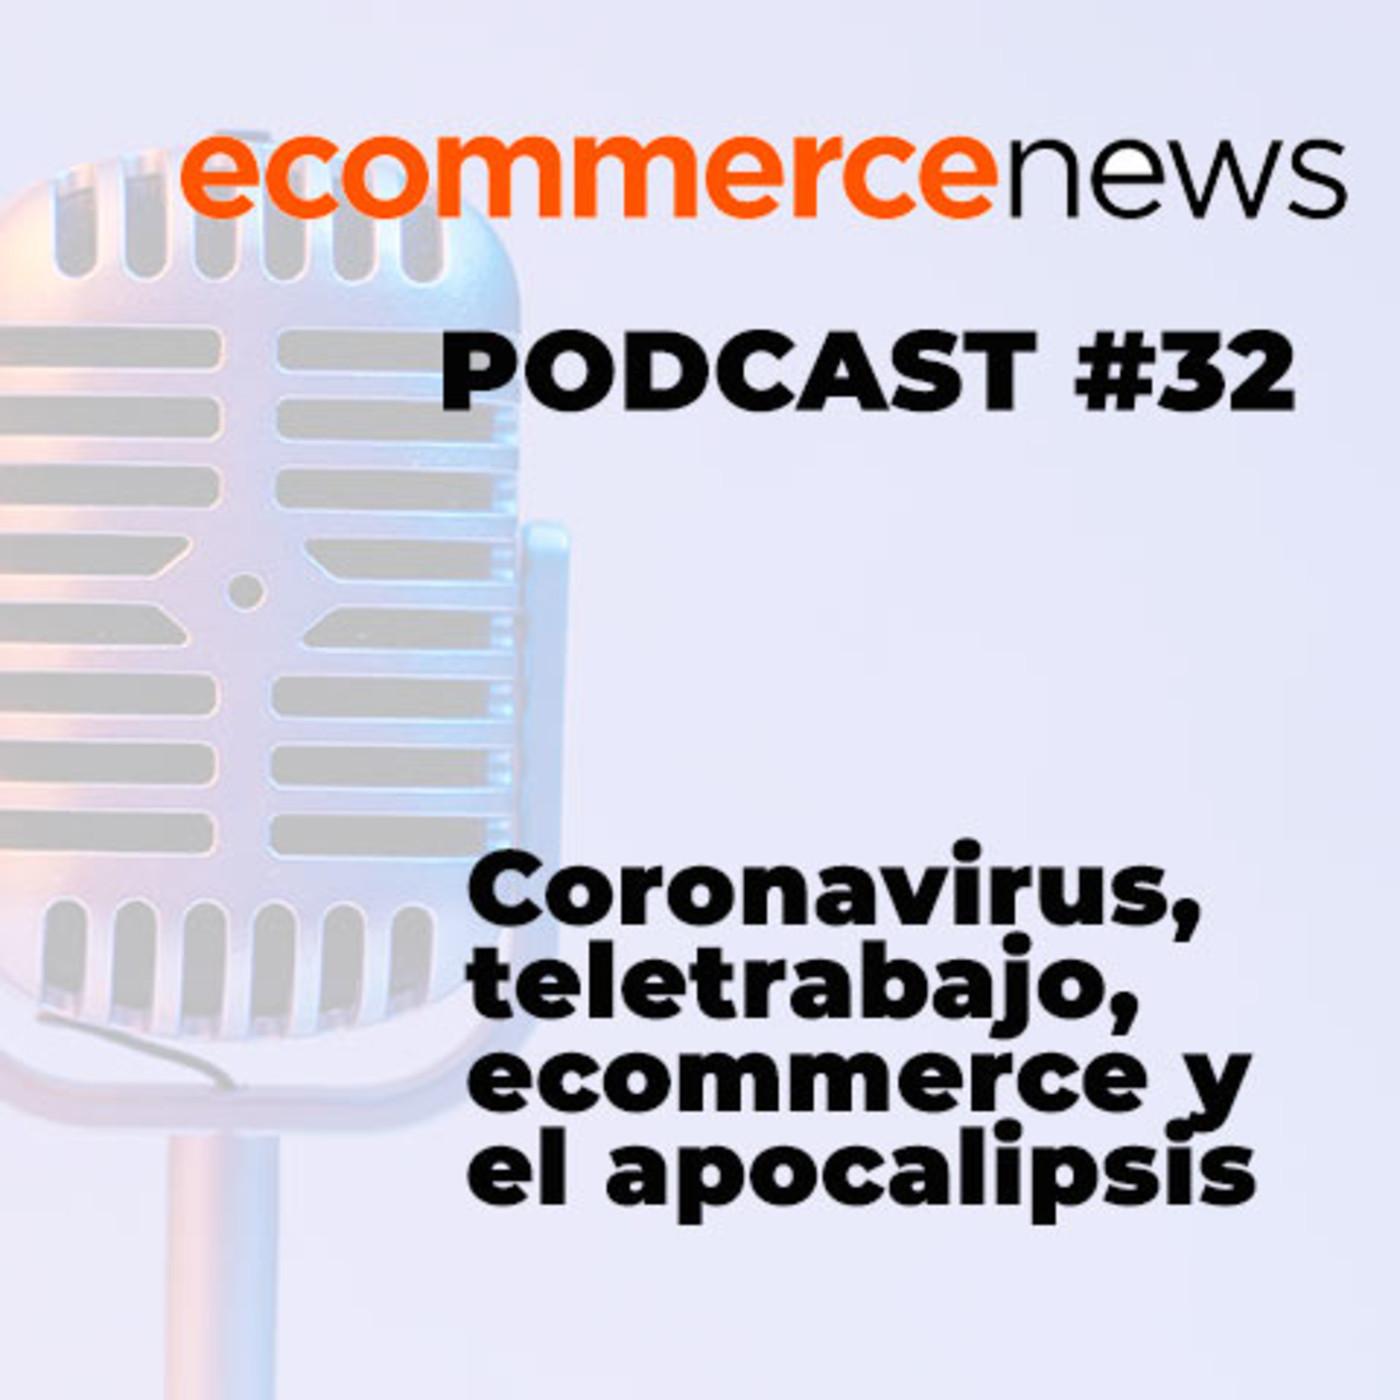 Ecommerce News Radio #32.Coronavirus, teletrabajo, ecommerce y el apocalipsis